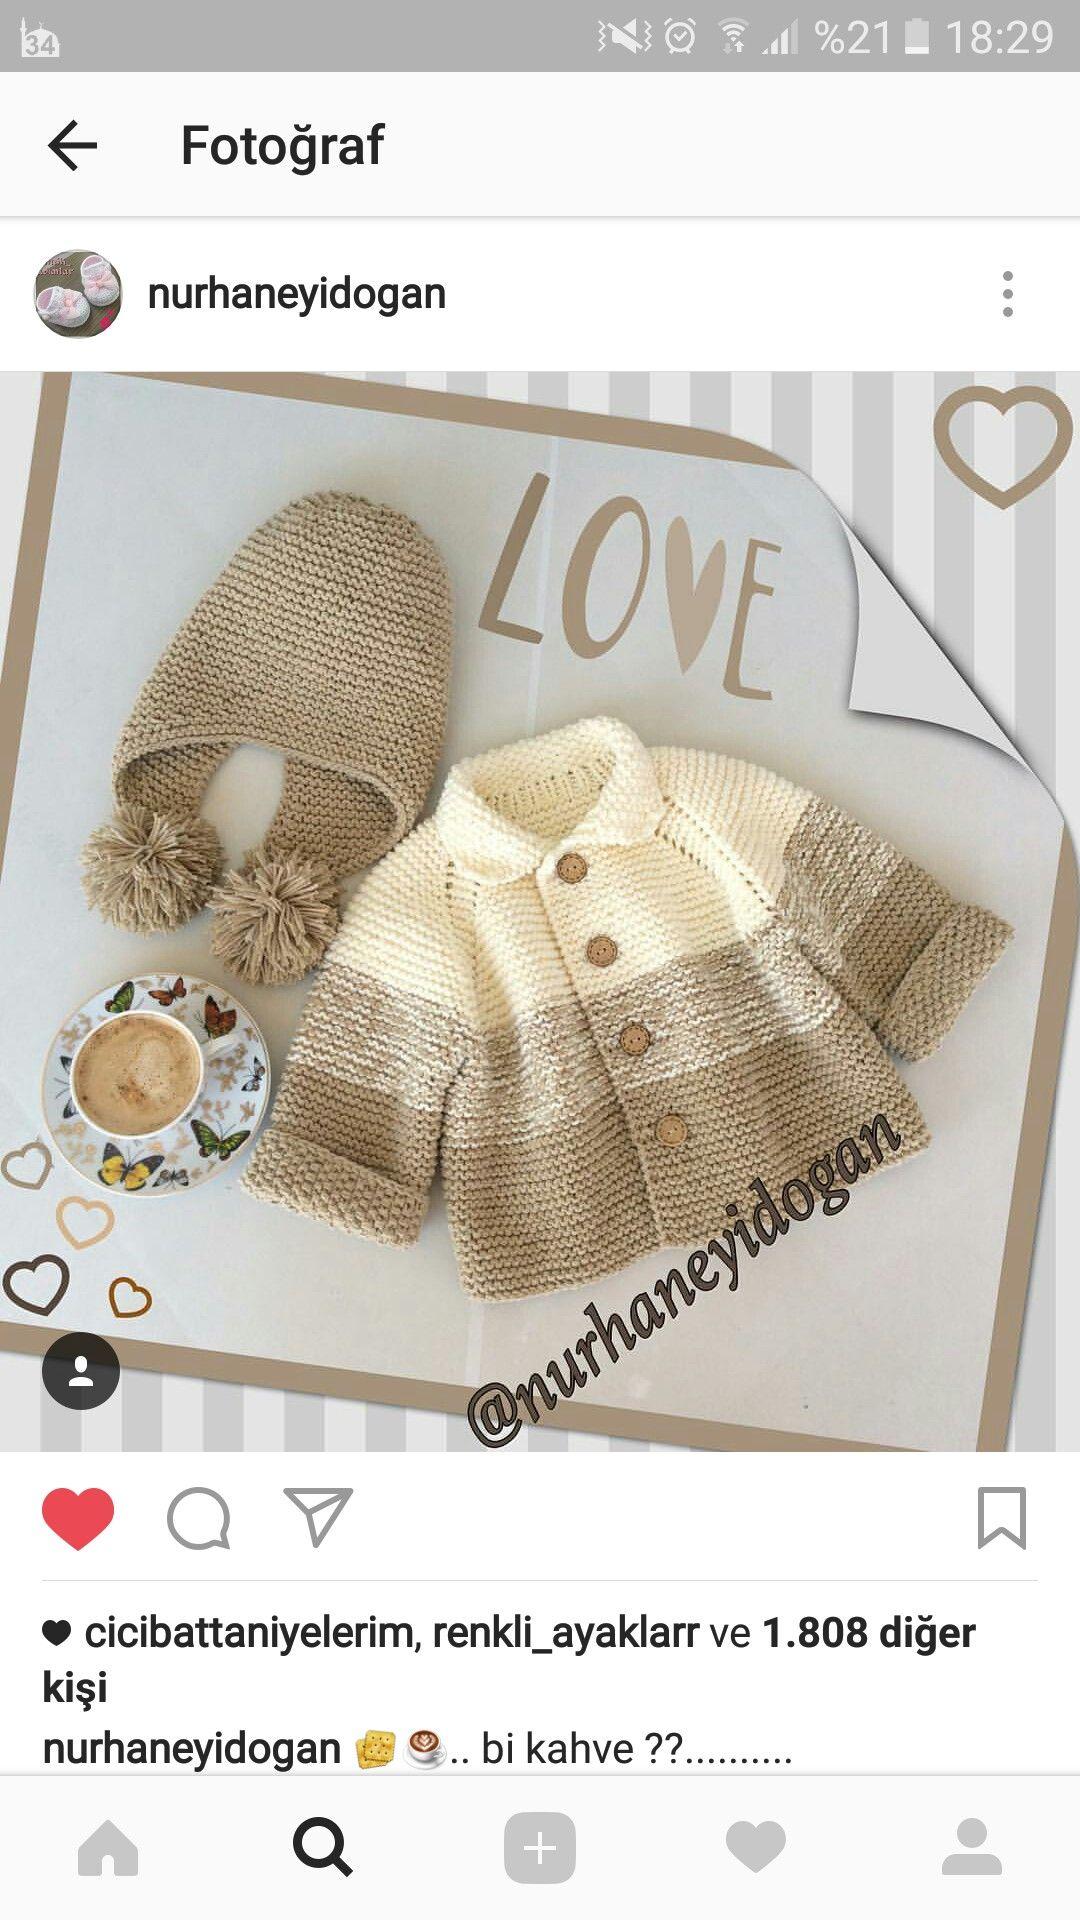 Pin de Menek Kedi en Örgü modelleri | Pinterest | Tejido, Bebe y Bebé